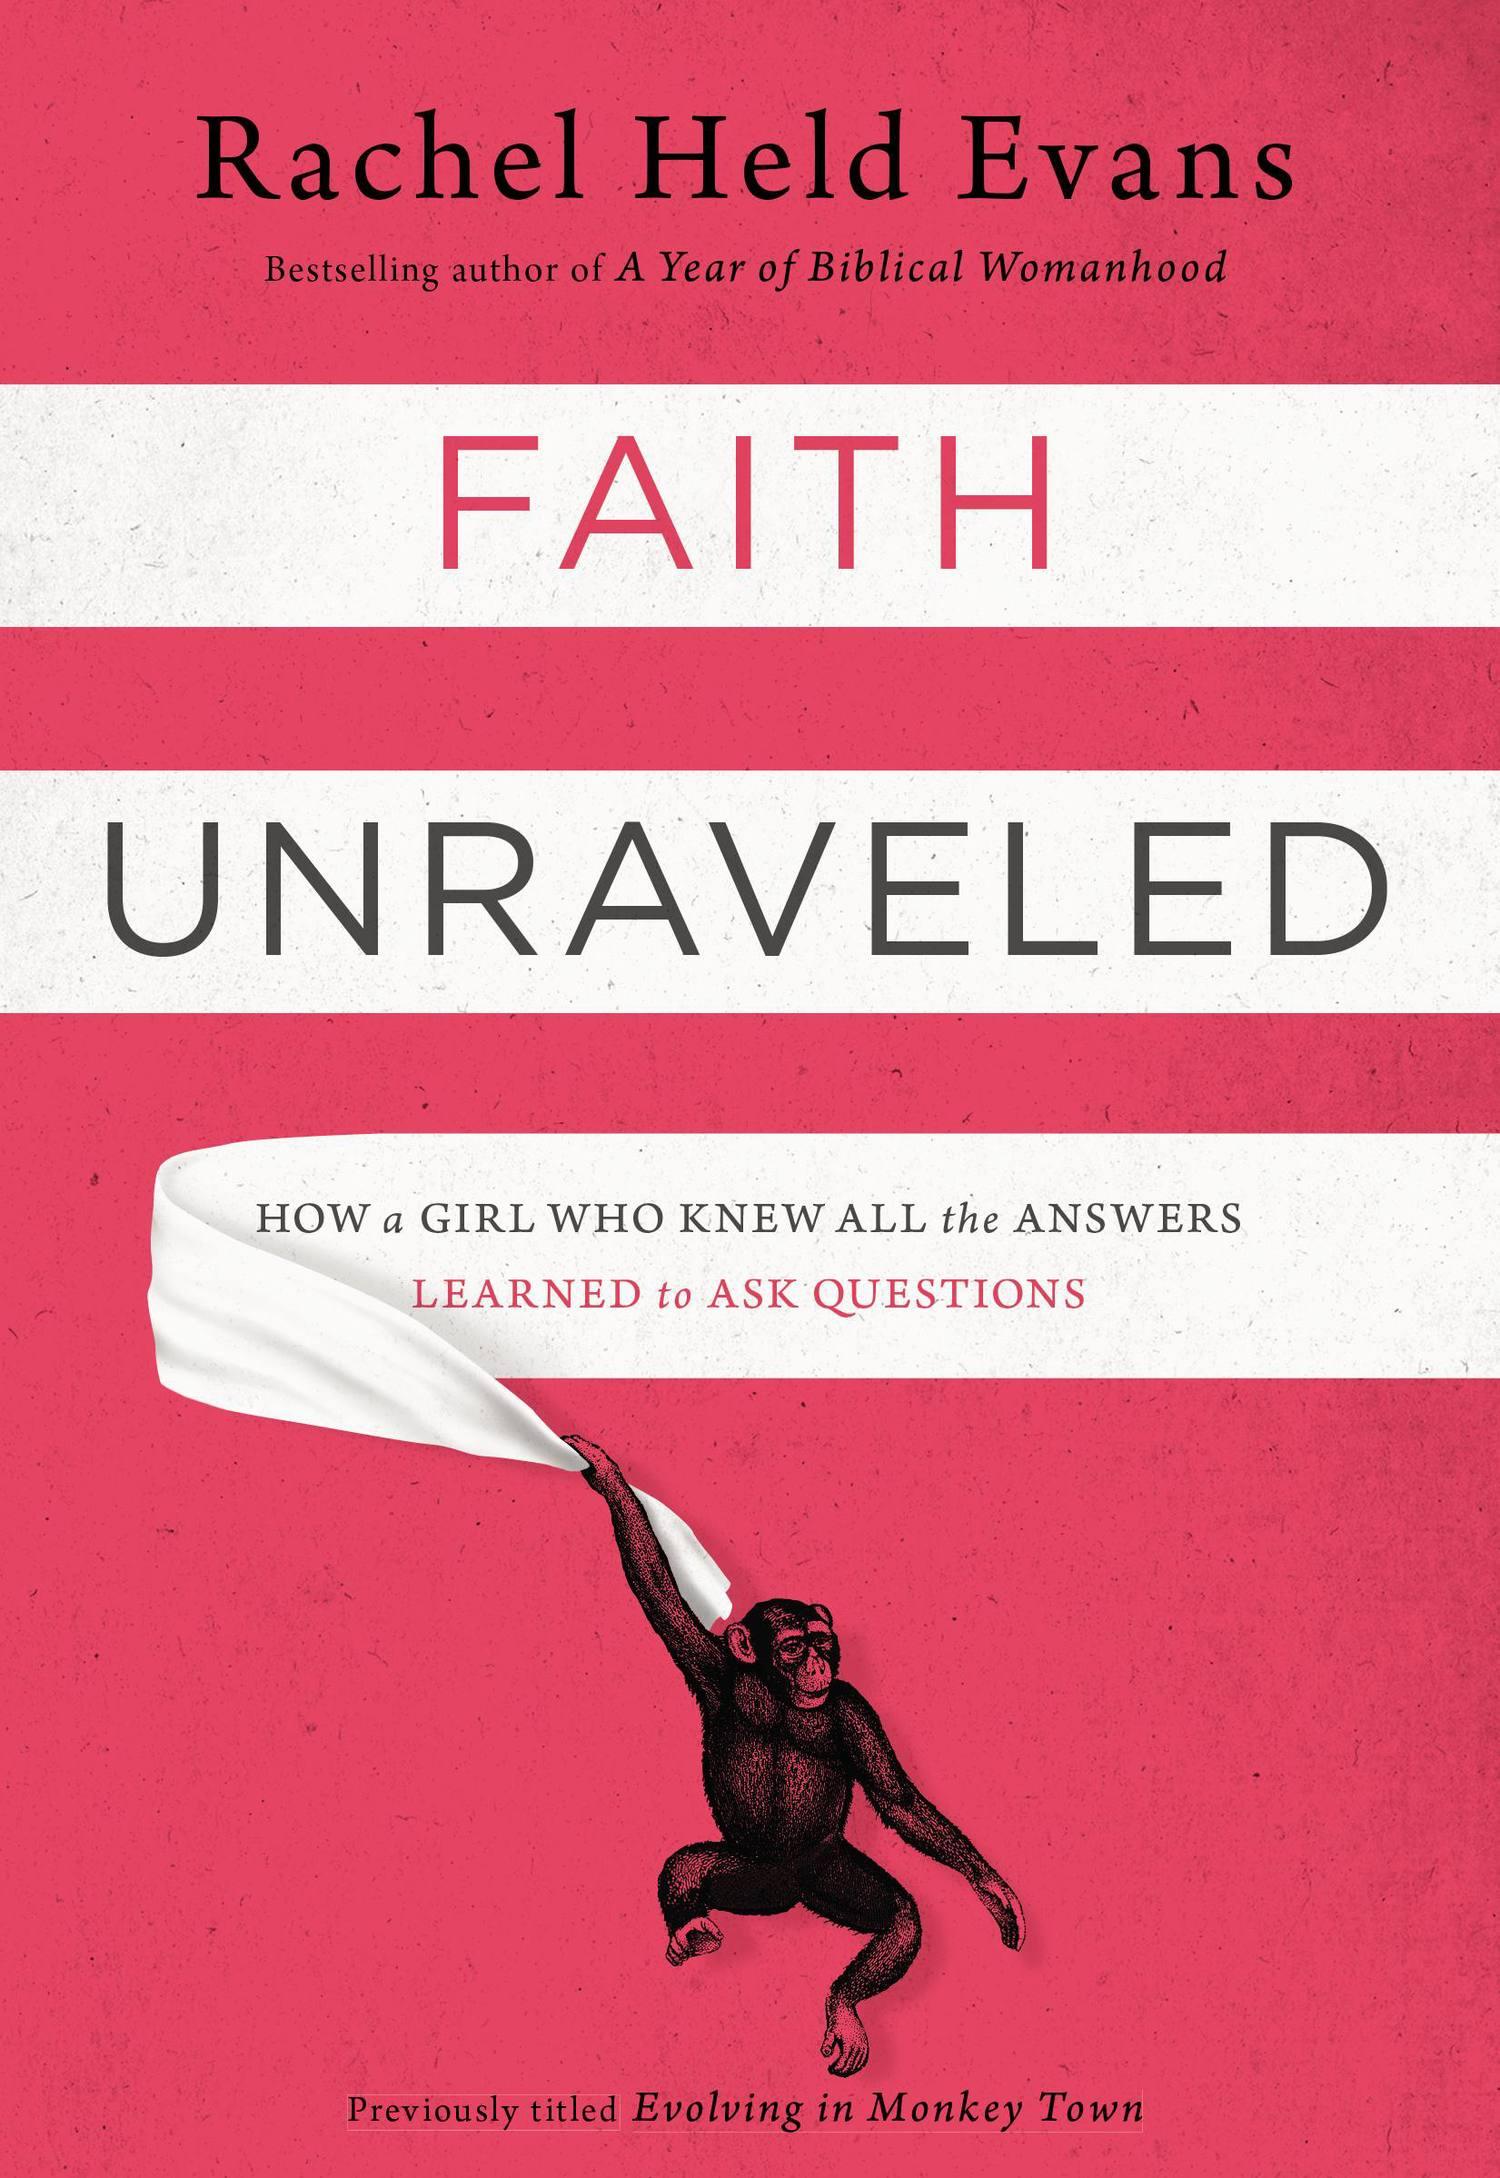 Faith_Unraveled.jpeg